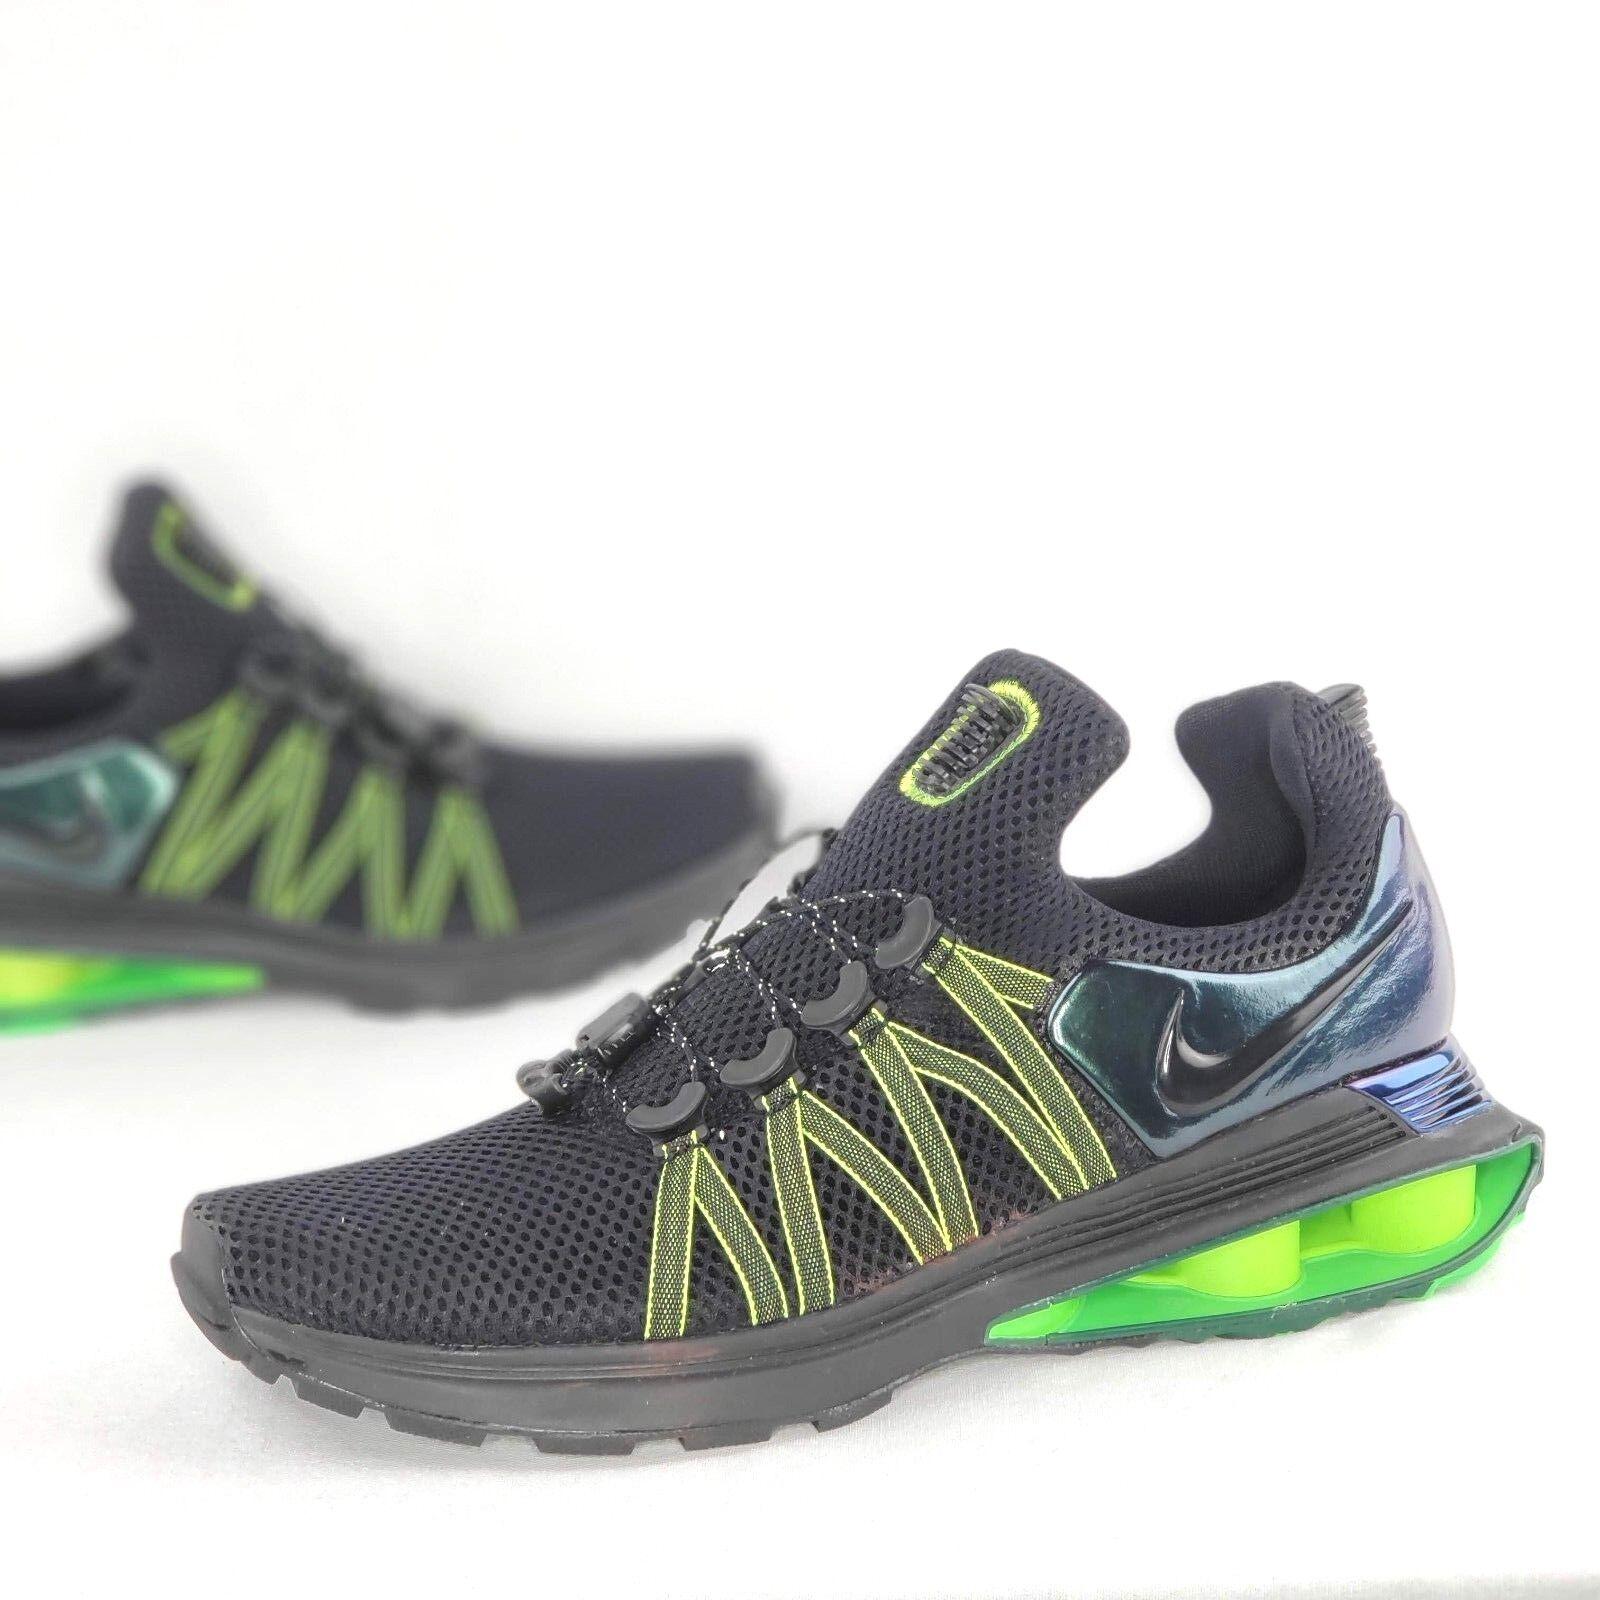 Nike Shox Gravity Mens Black Gorge Green Hot Lime Running shoes AR1999 003